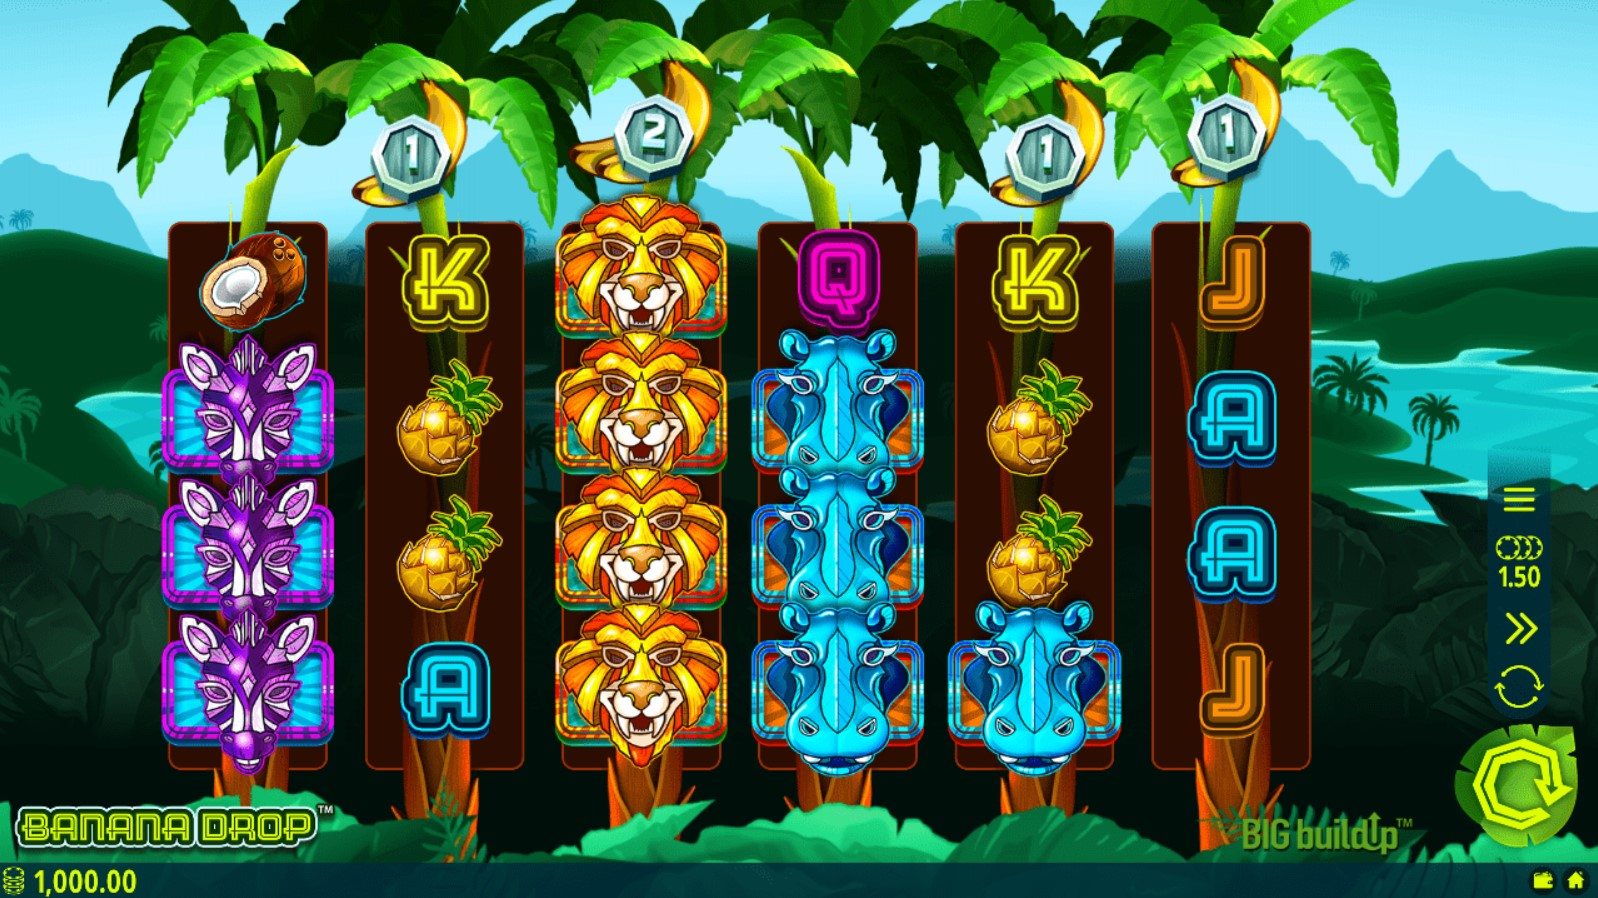 banana-drop-slot-gameplay